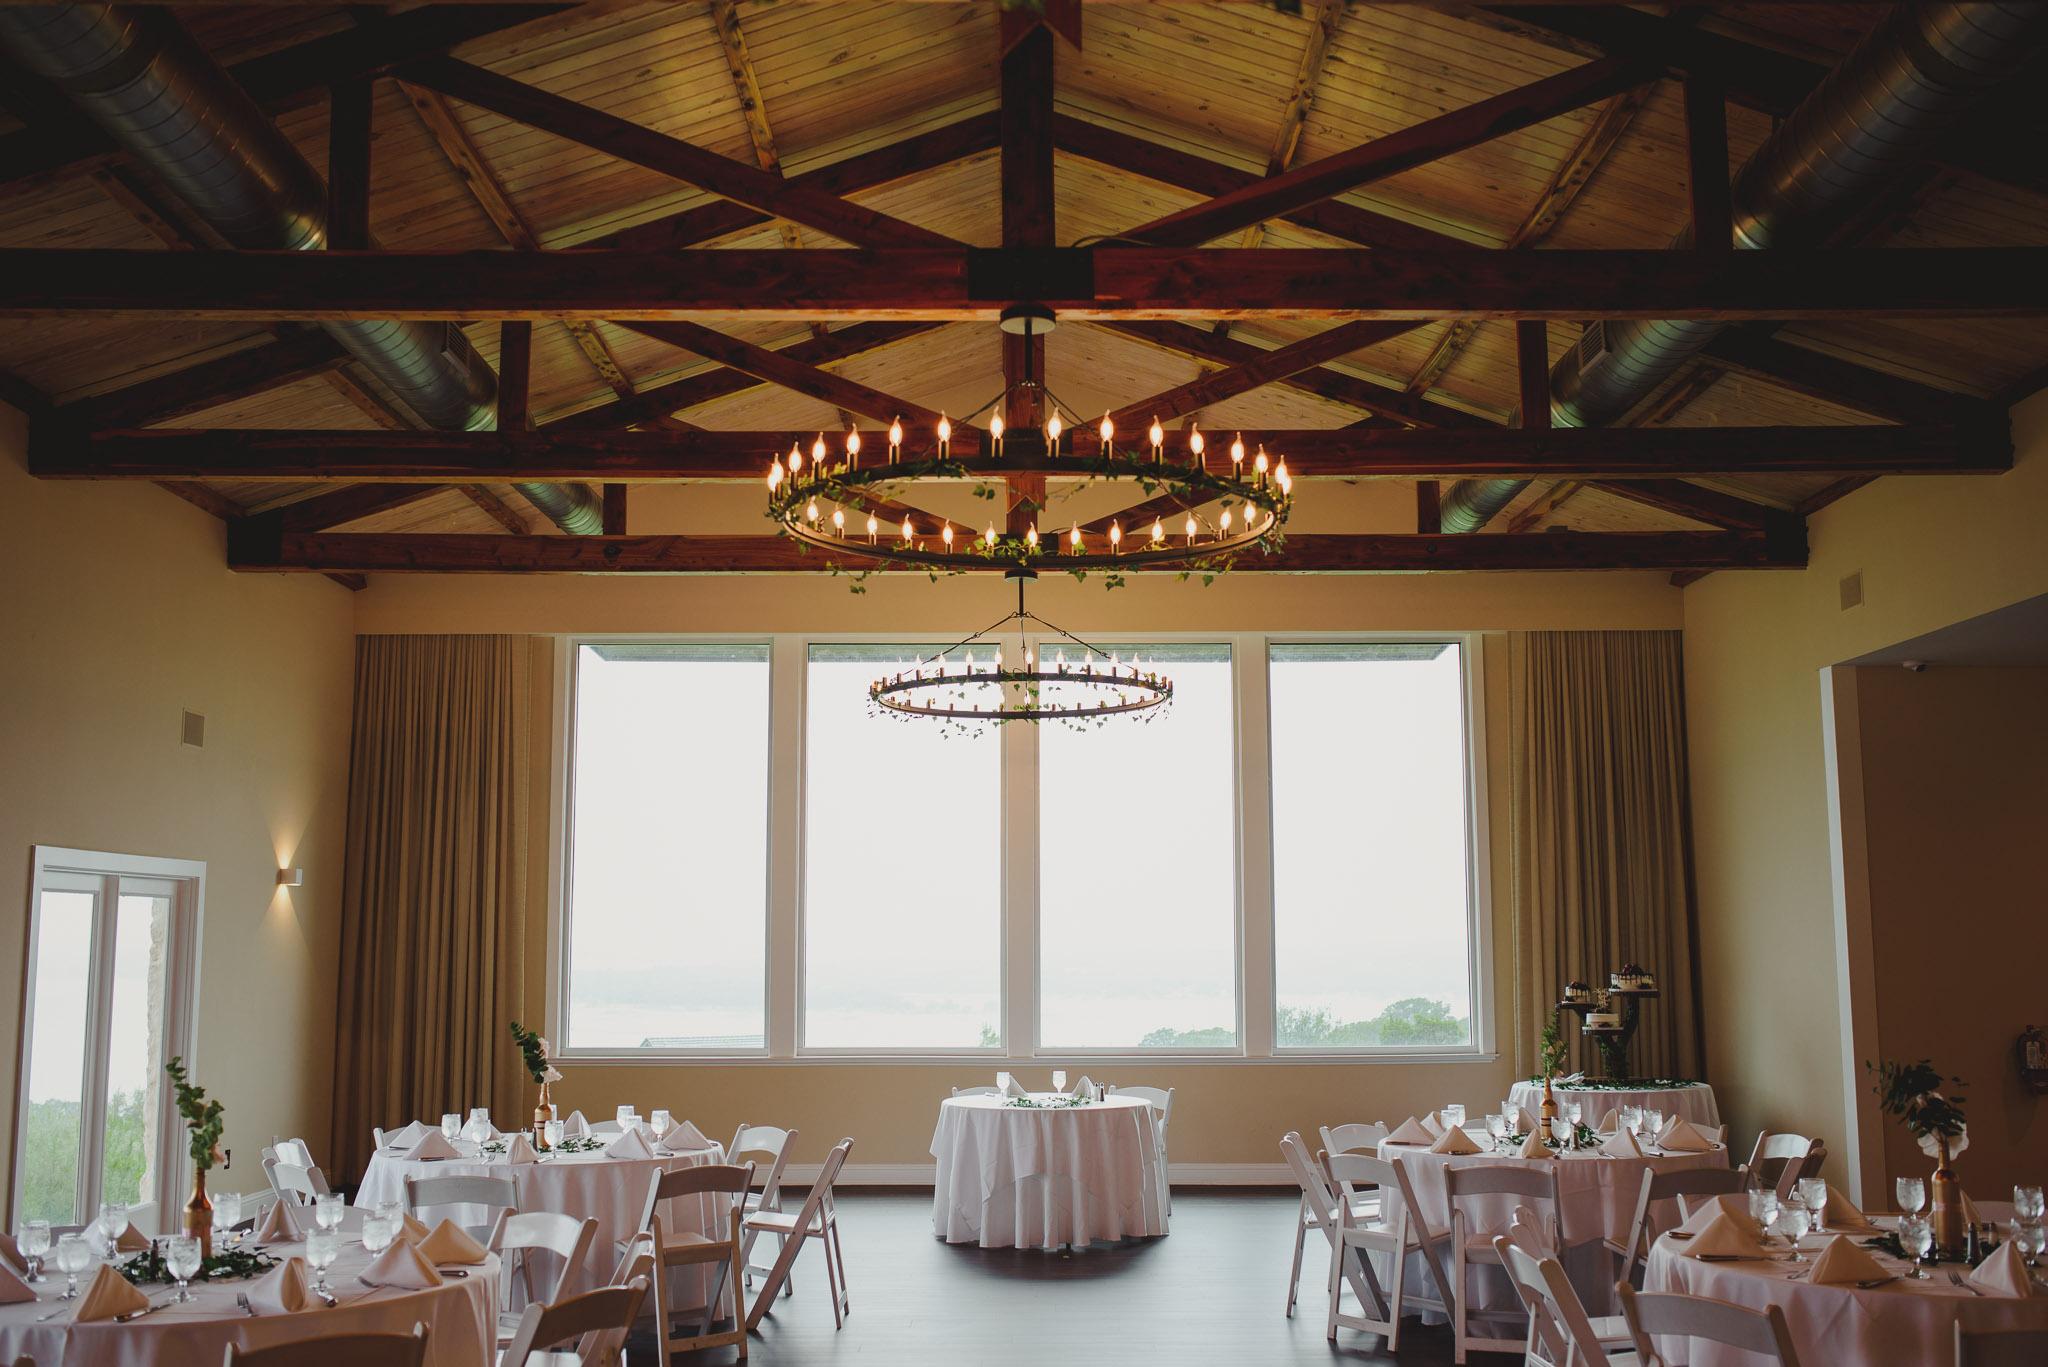 Austin-Texas-Wedding-Vintage-Villas-0020.jpg